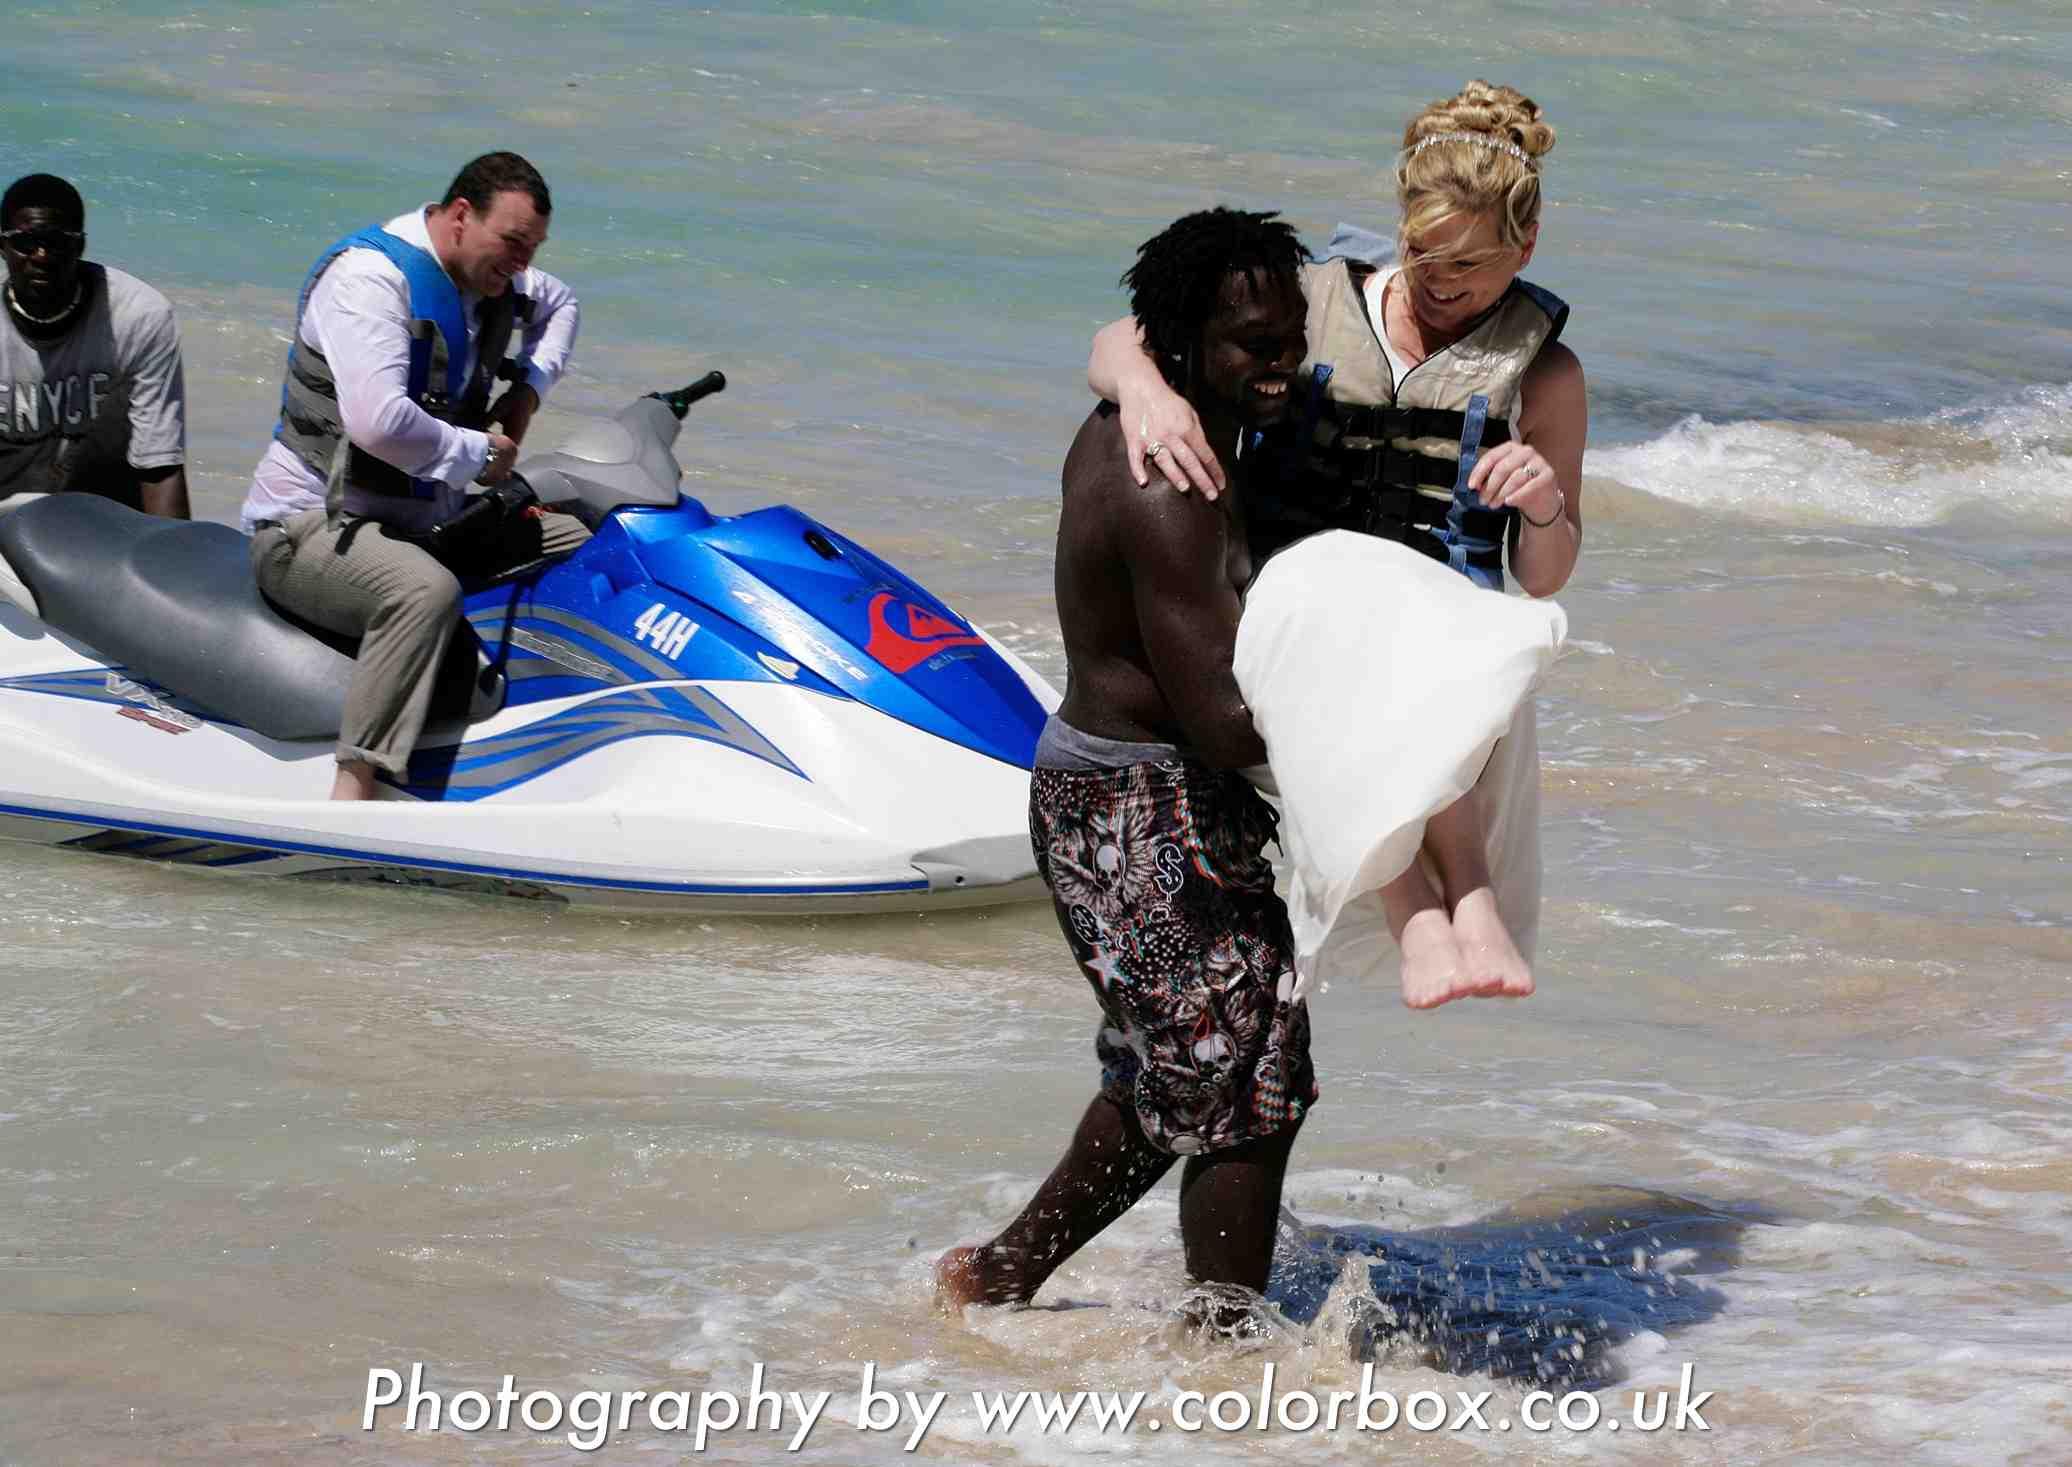 Barbados – A tropical wedding destination